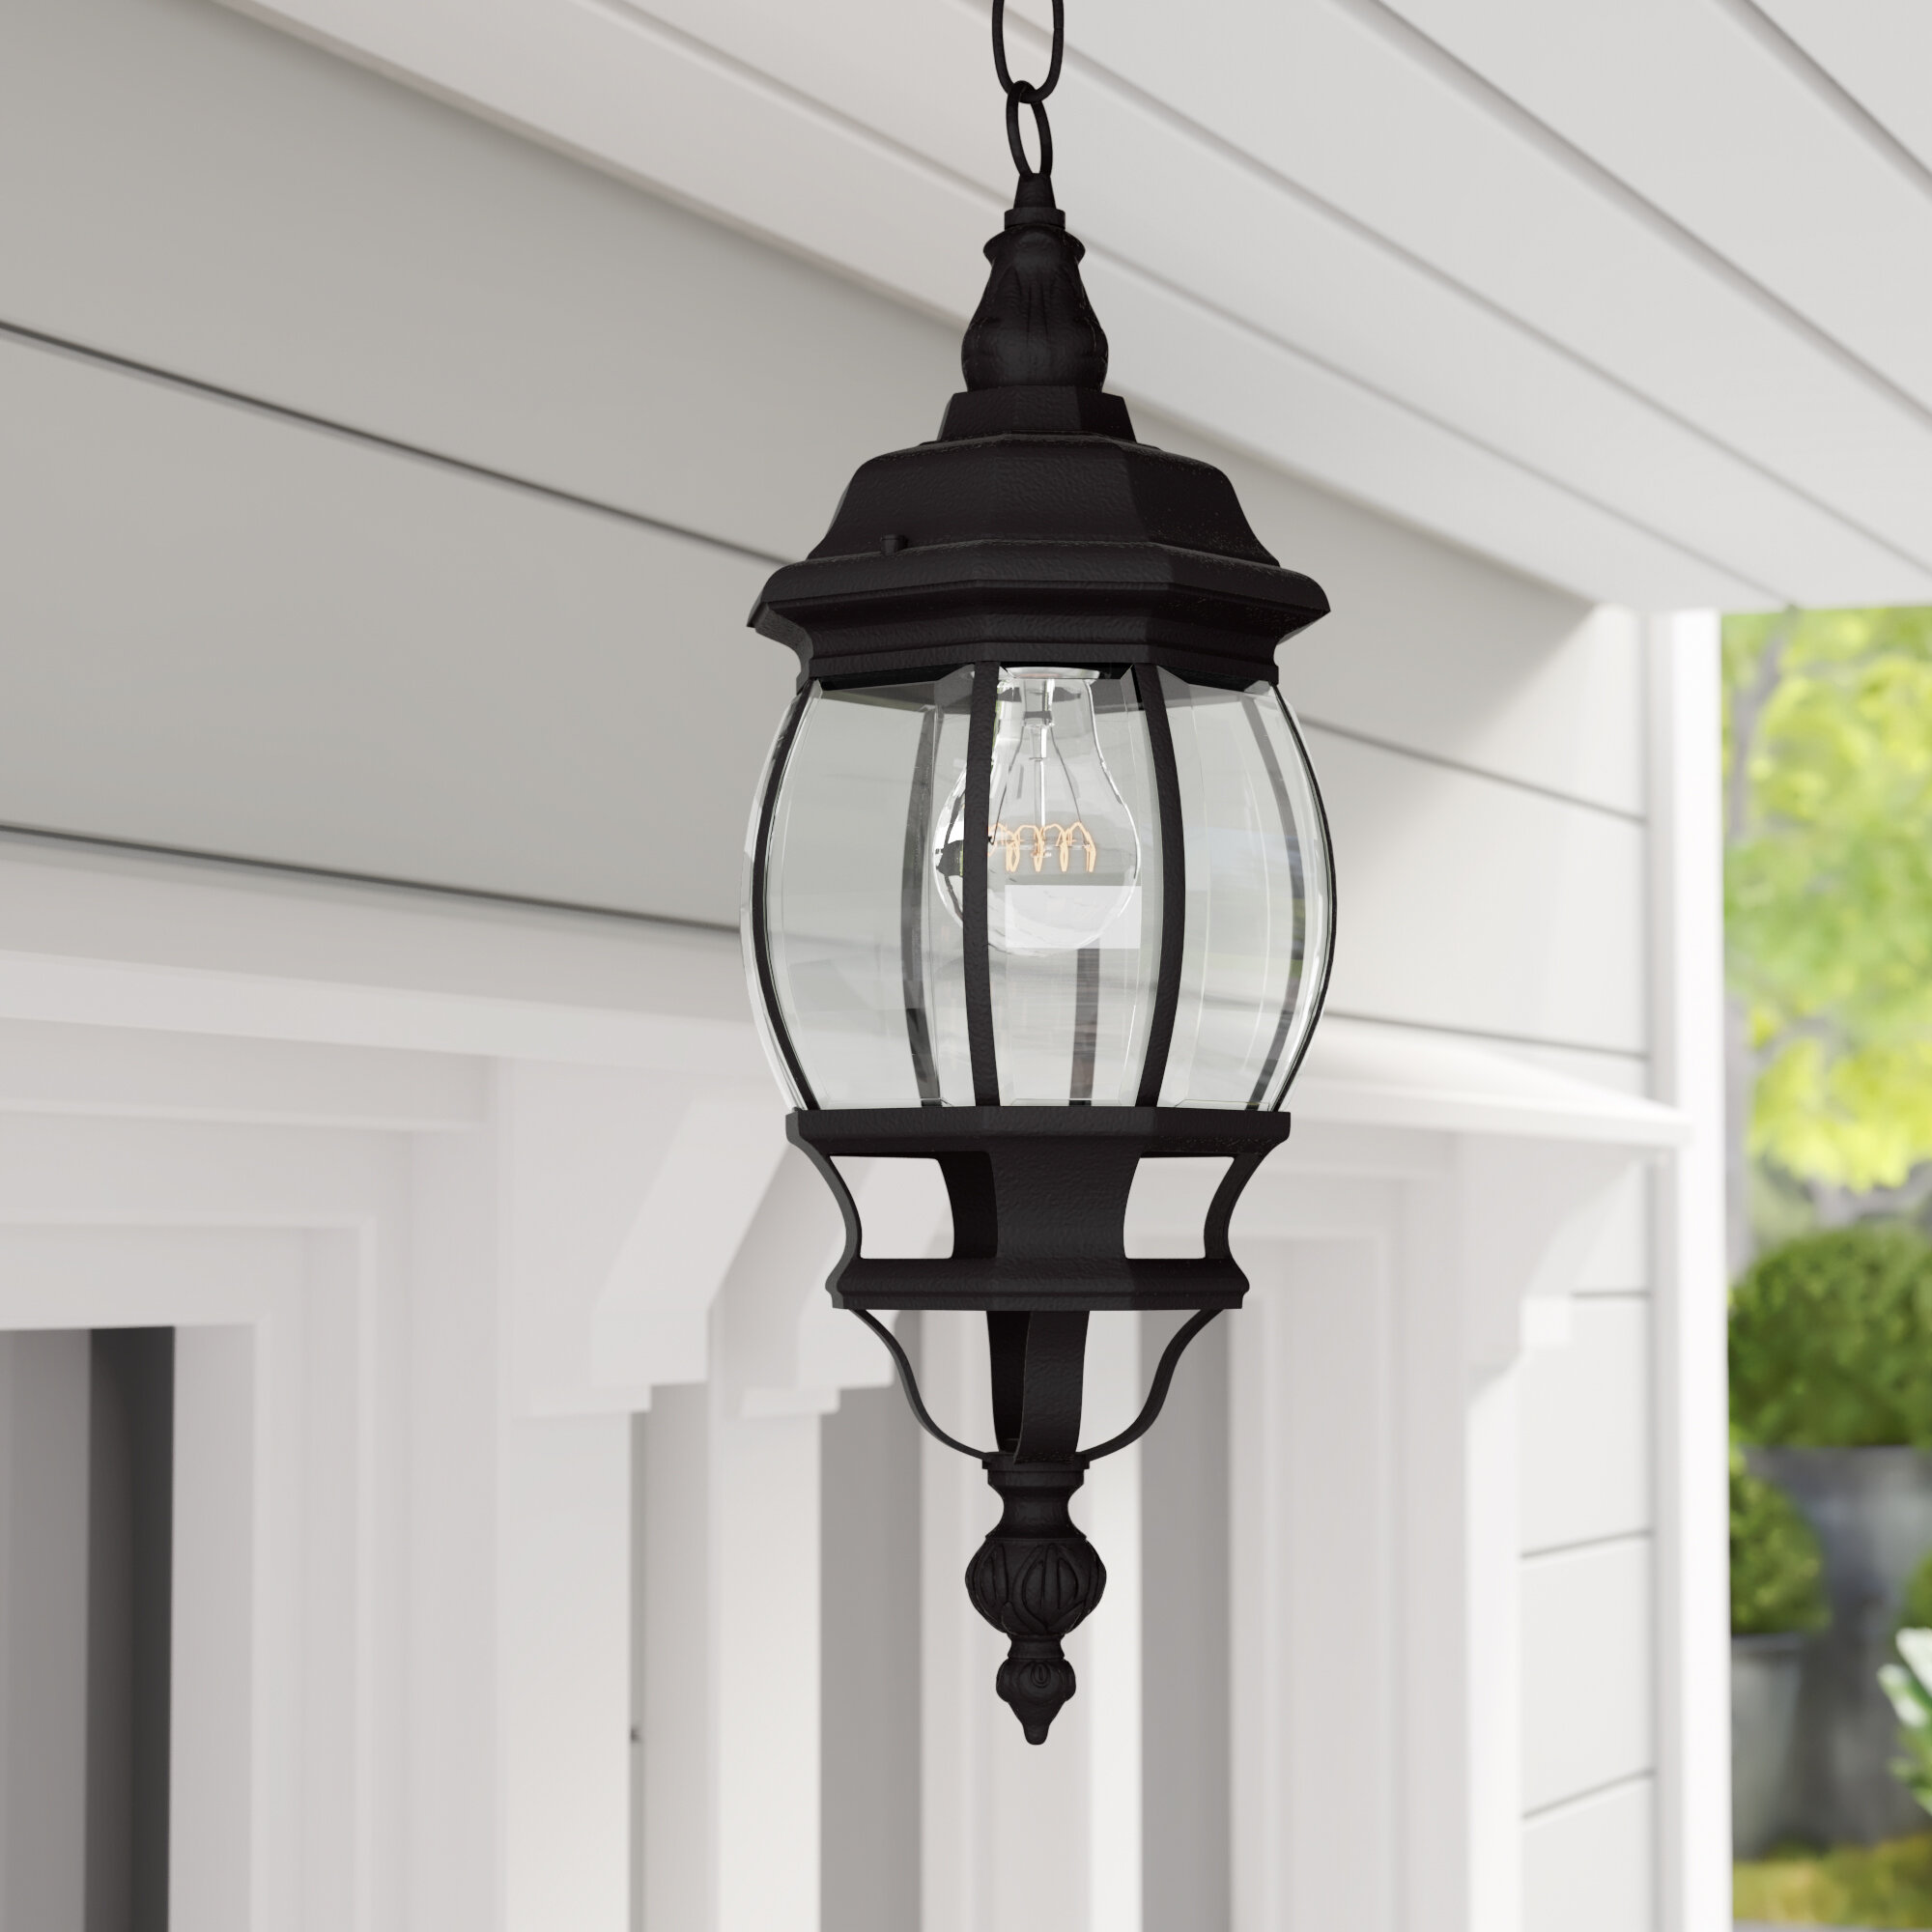 Breakwater Bay Frederica 1 Bulb 18 75 H Outdoor Hanging Lantern Reviews Wayfair